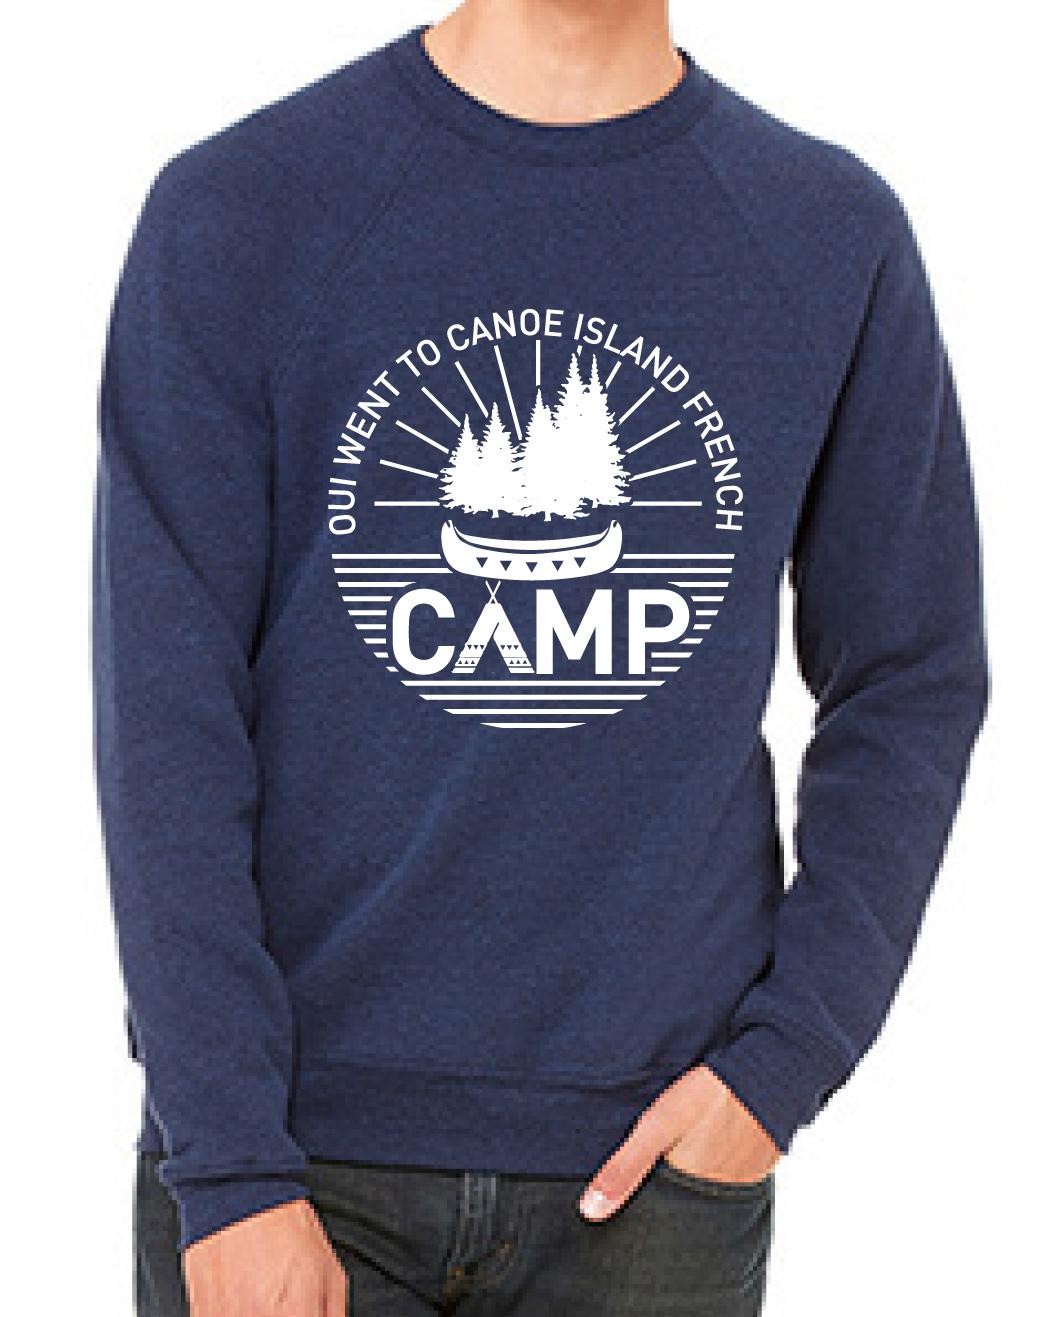 CampMockup